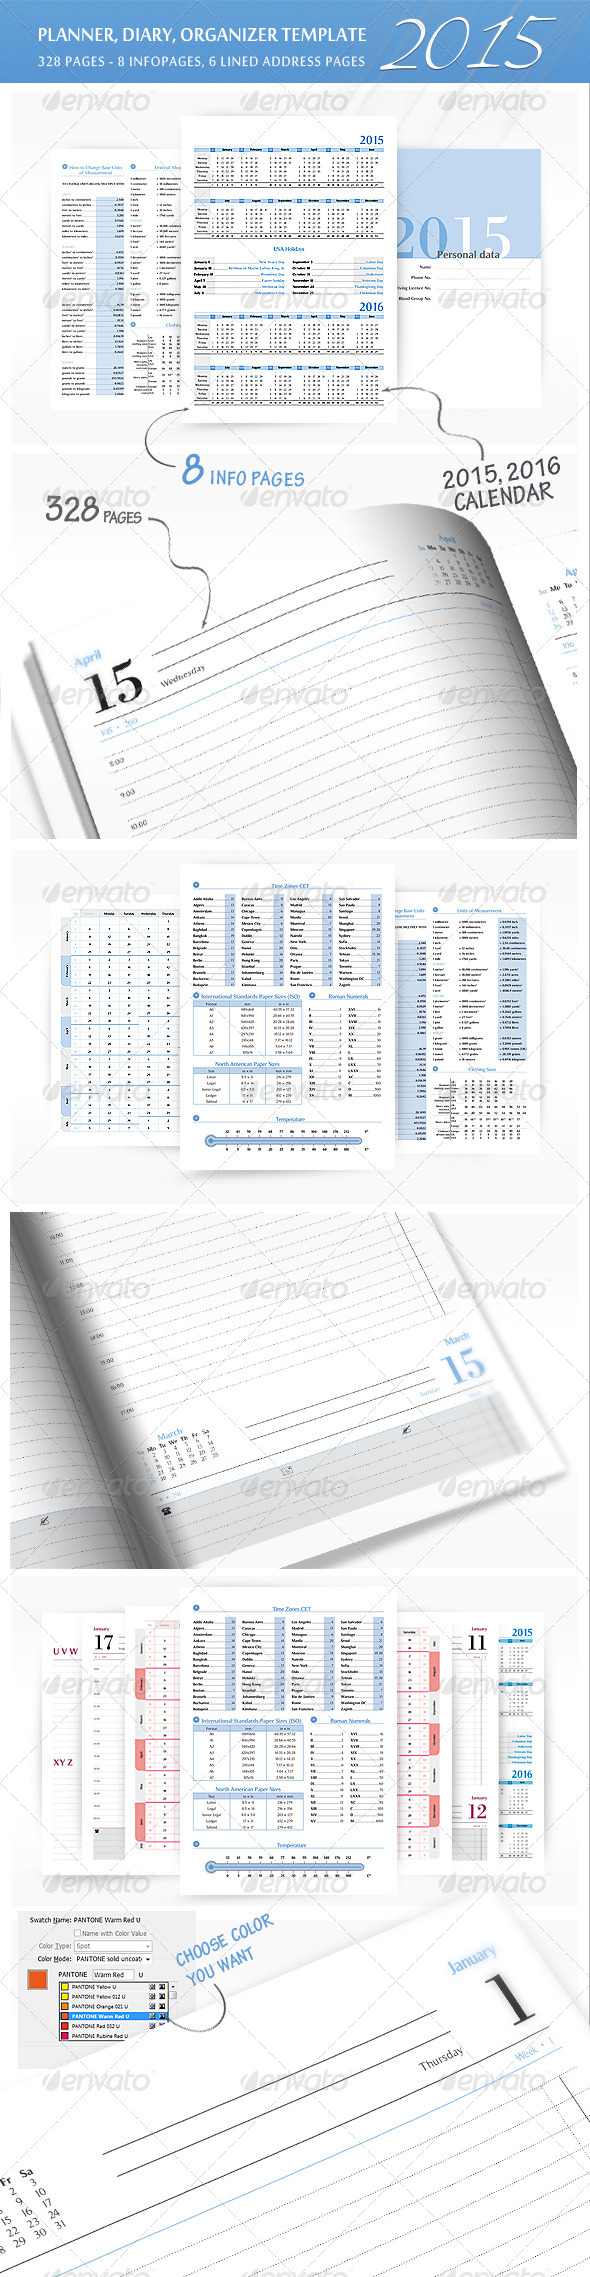 GraphicRiver Planner-Diary-Organizer 2015 7788091